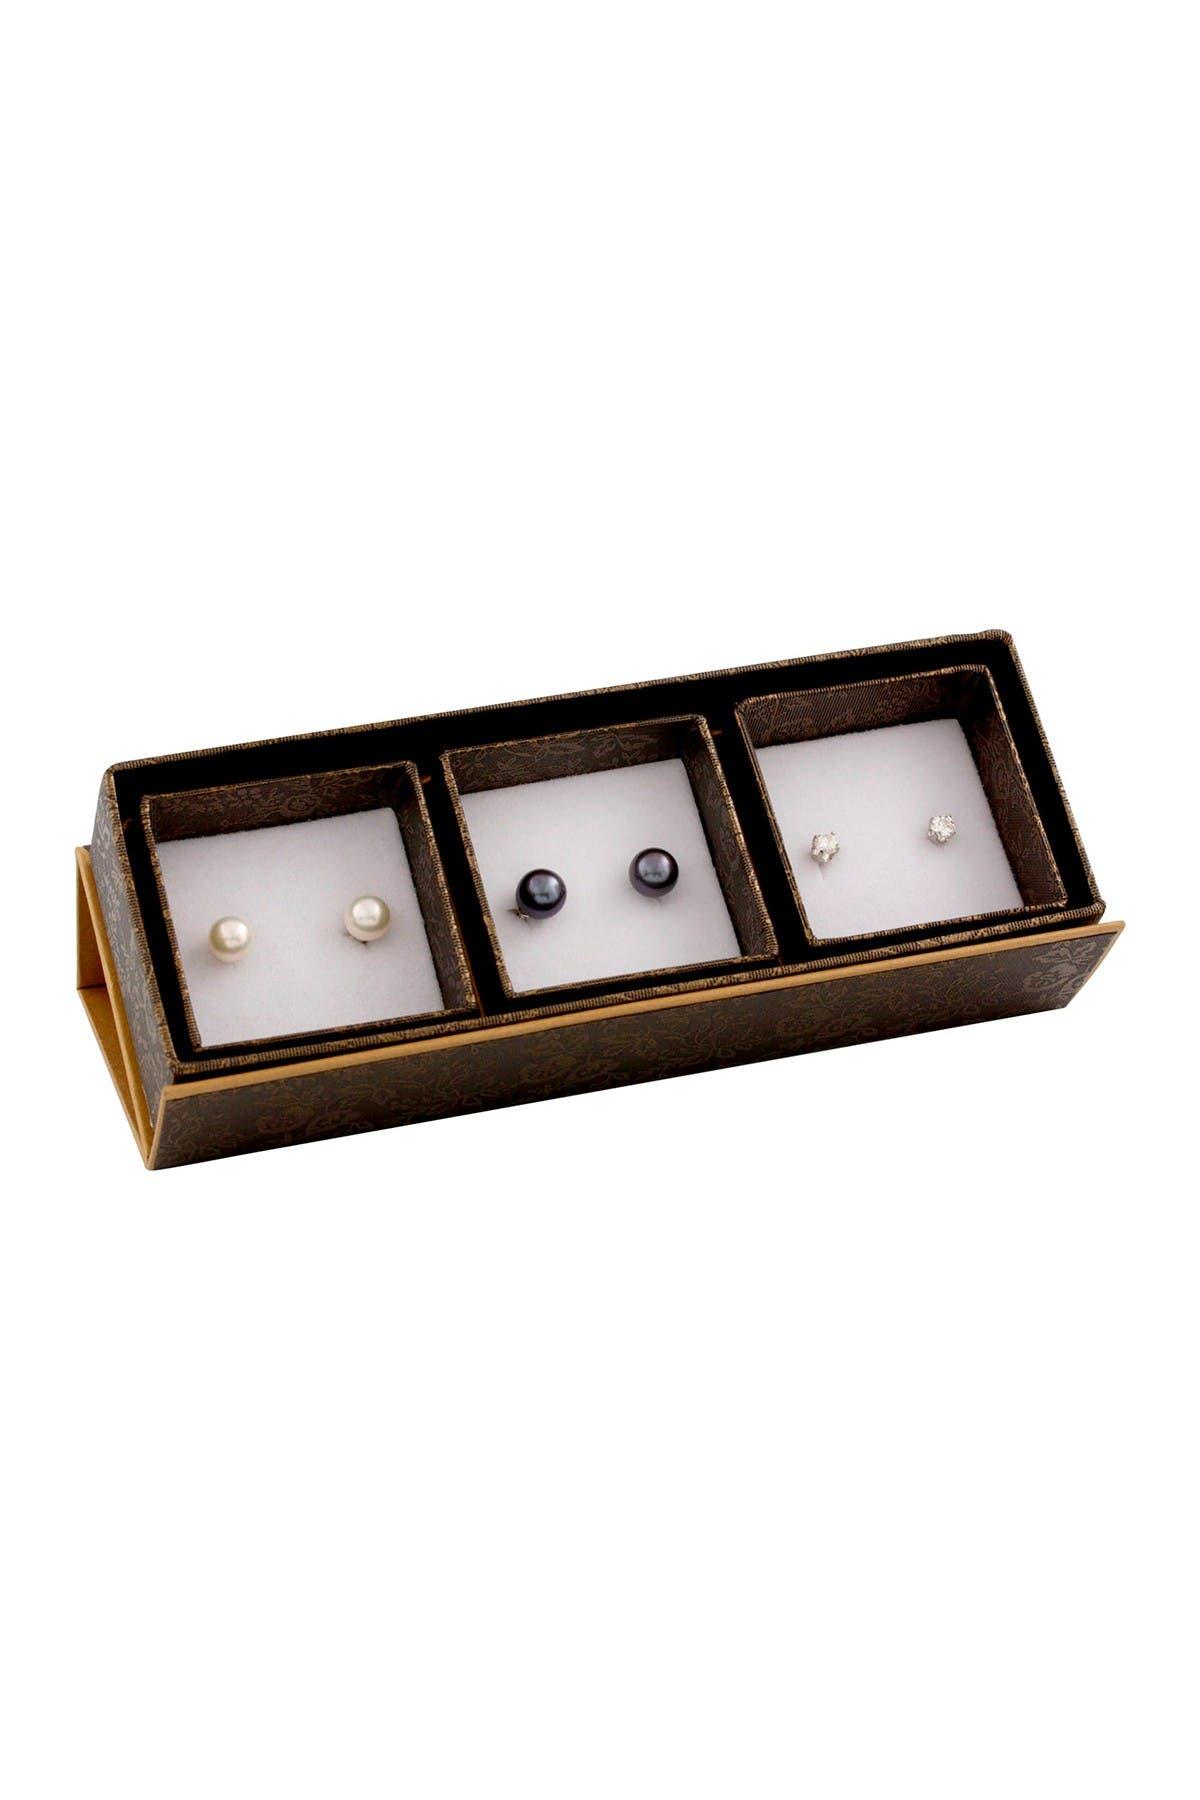 Image of Splendid Pearls 7-7.5mm Dyed Black & Natural White Cultured Freshwater Pearls Stud Earrings Set